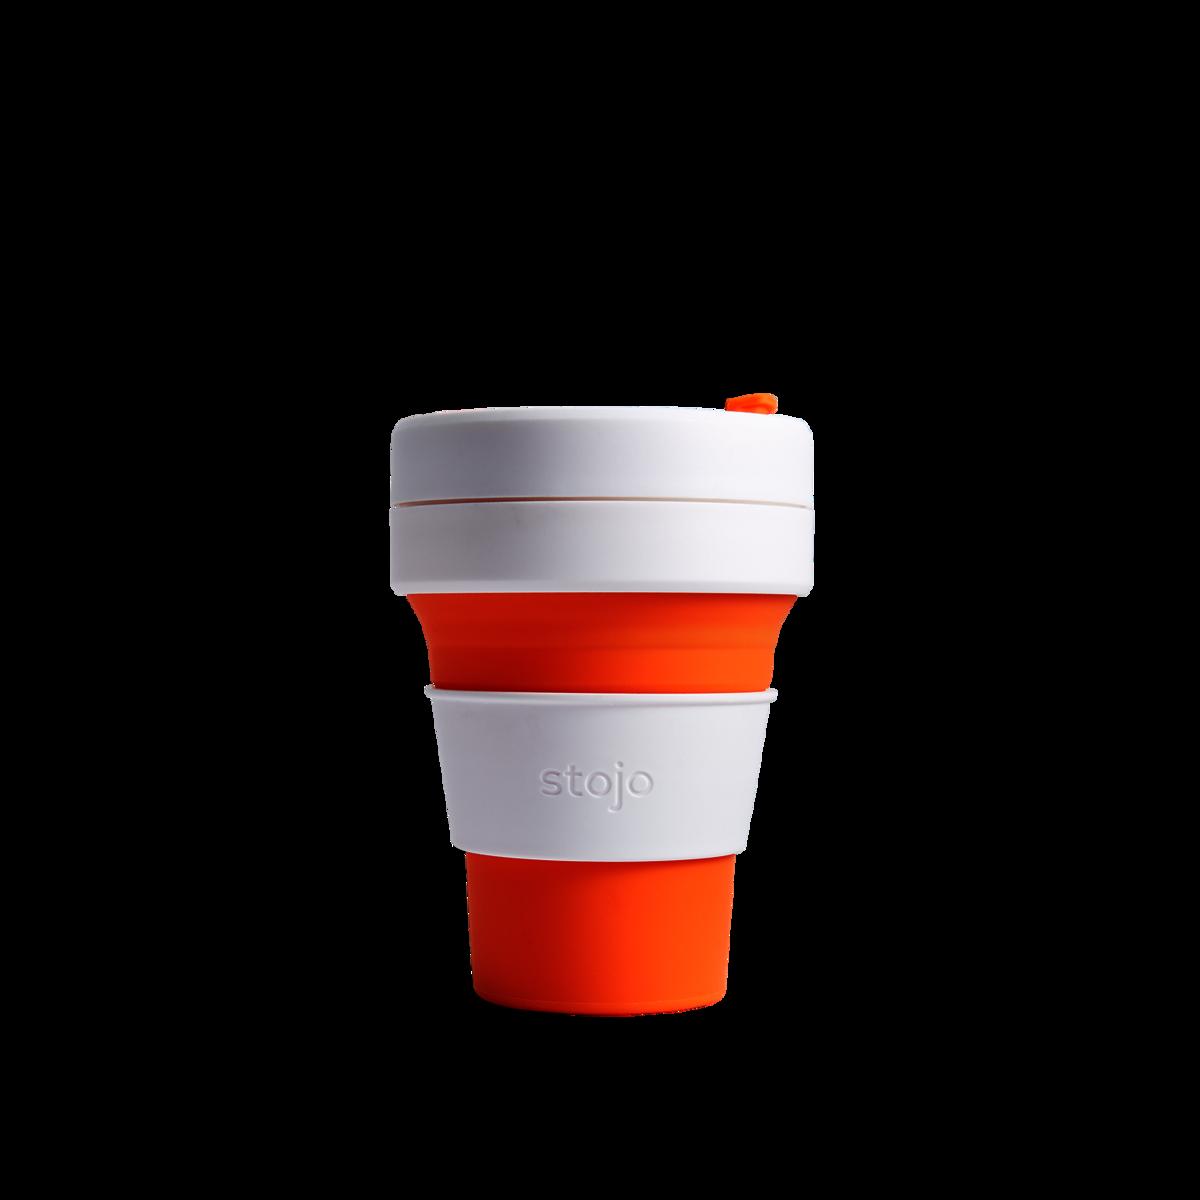 12安士可壓縮口袋杯 - 橙色